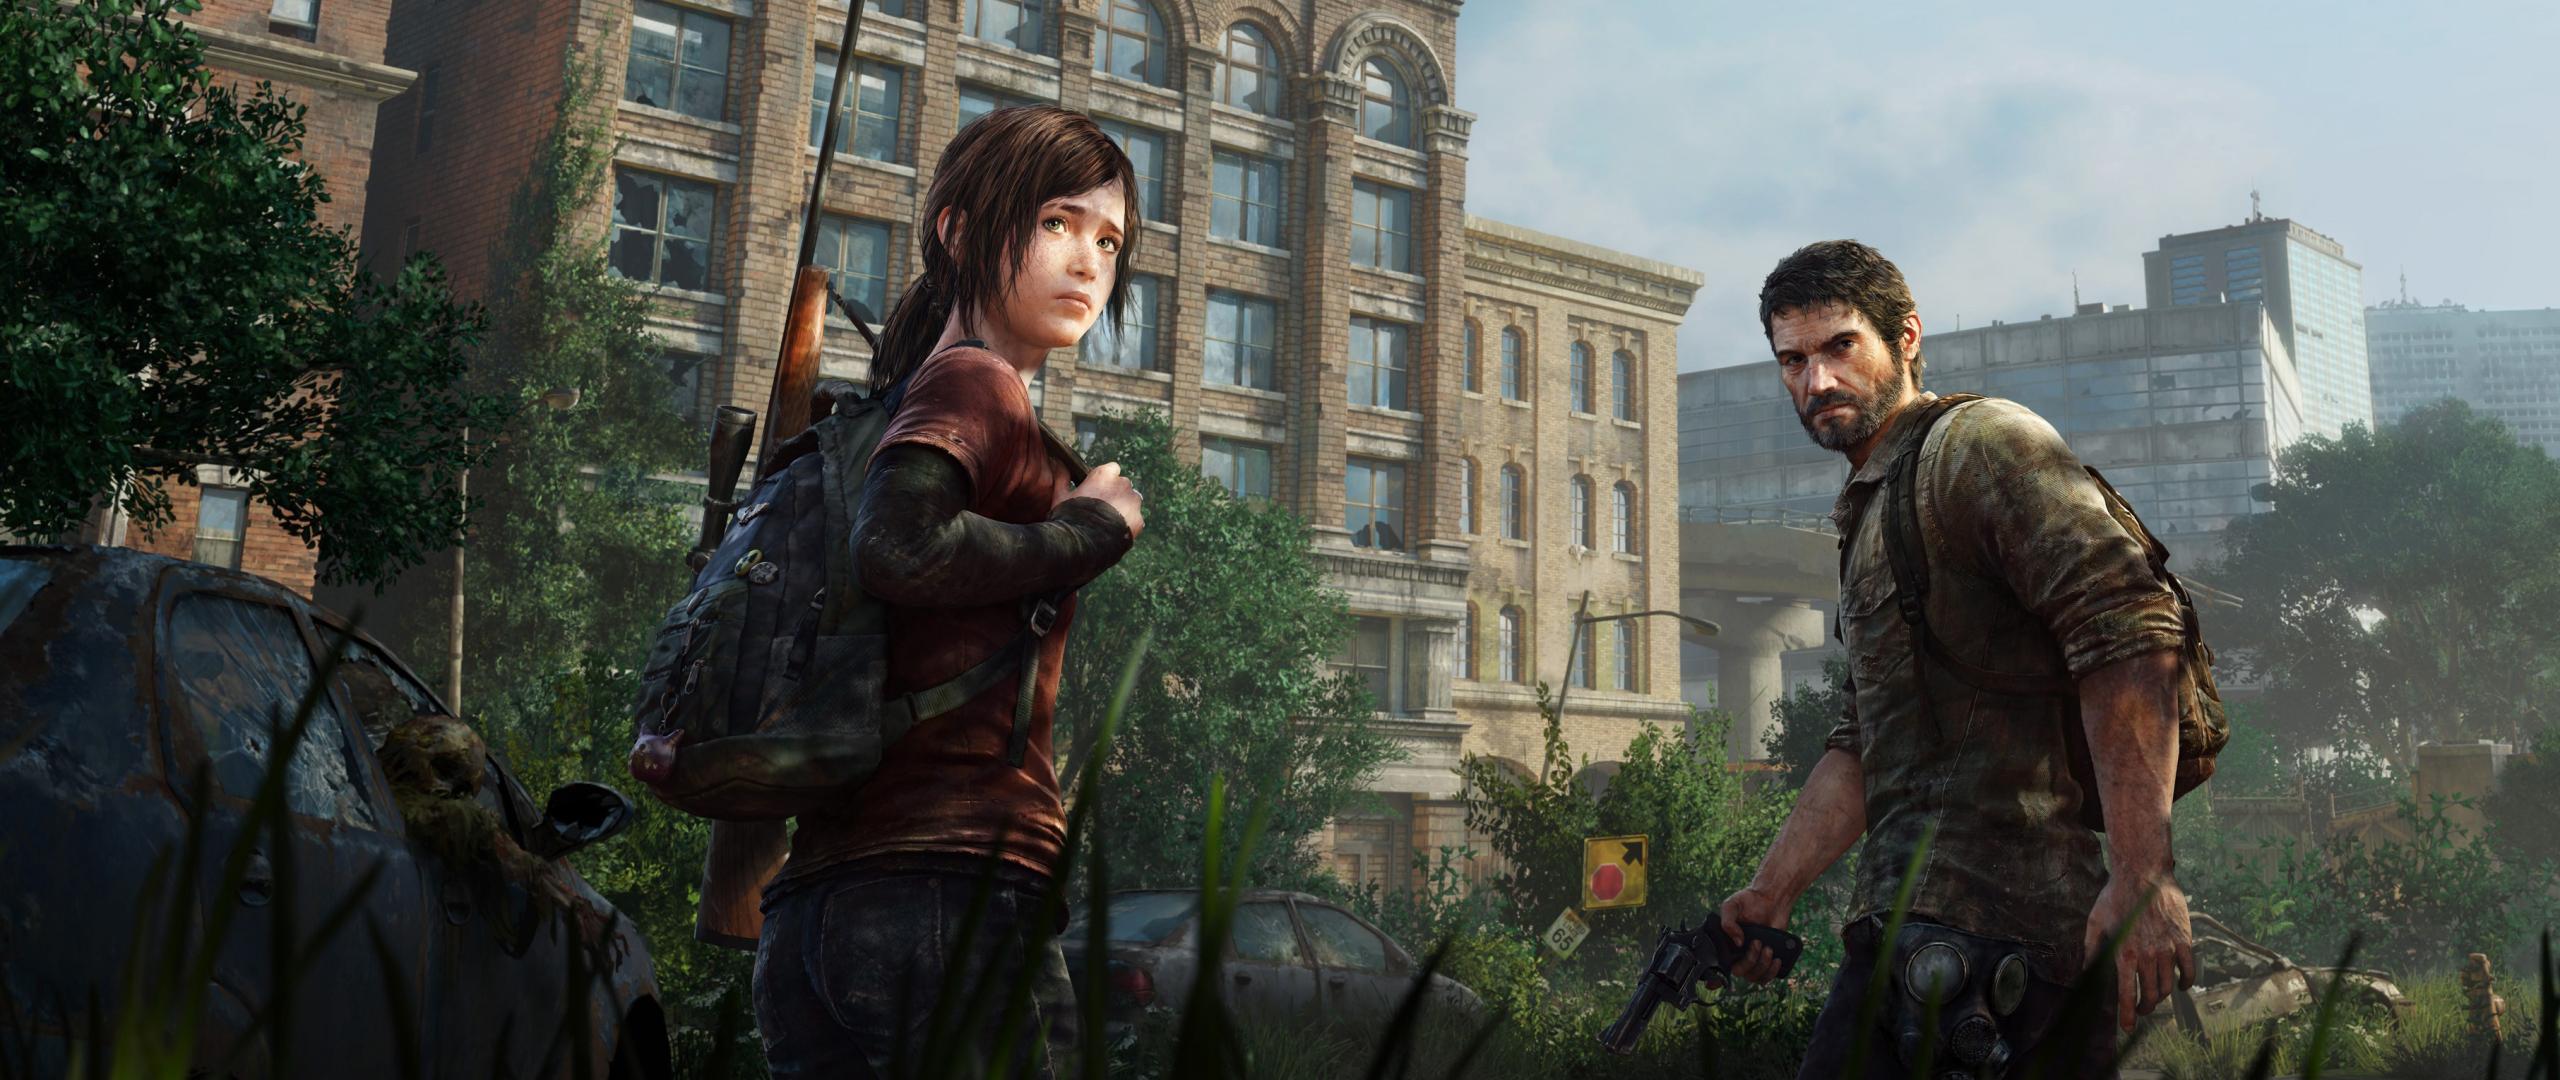 2560x1080 The Last Of Us 2560x1080 Resolution Wallpaper ...